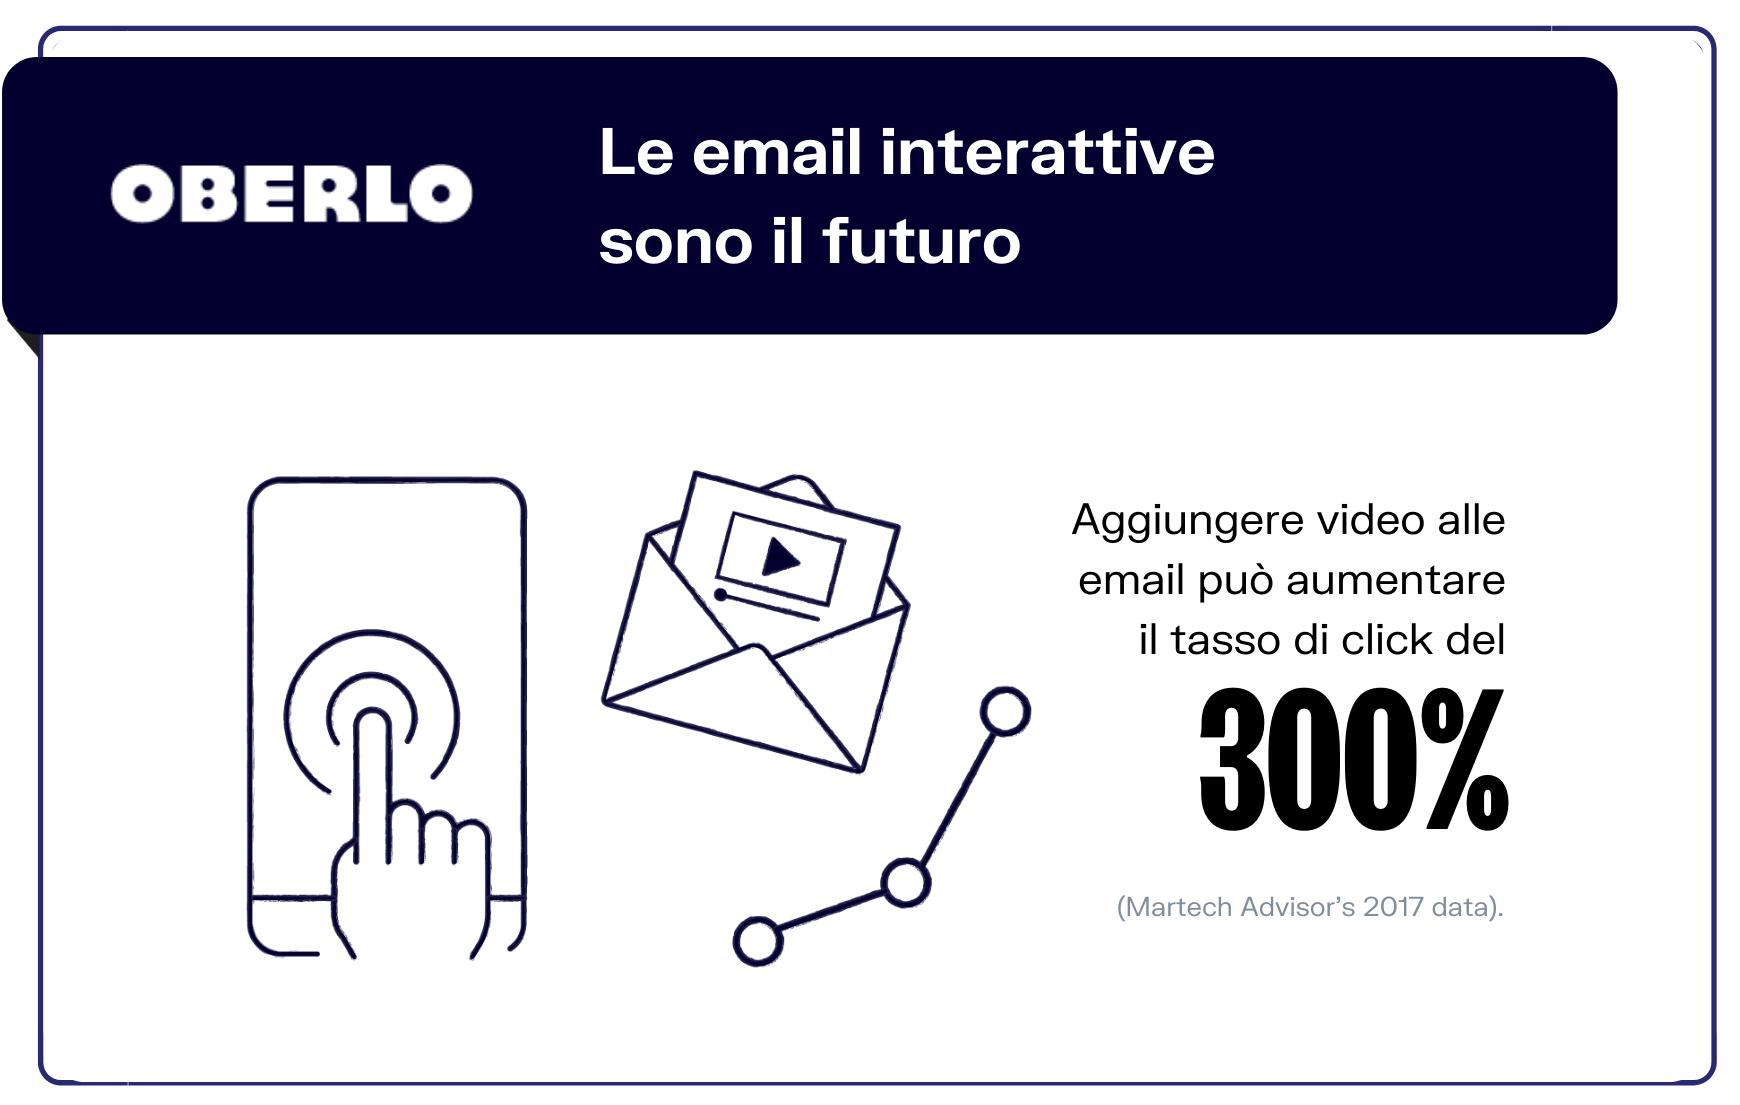 email interattive